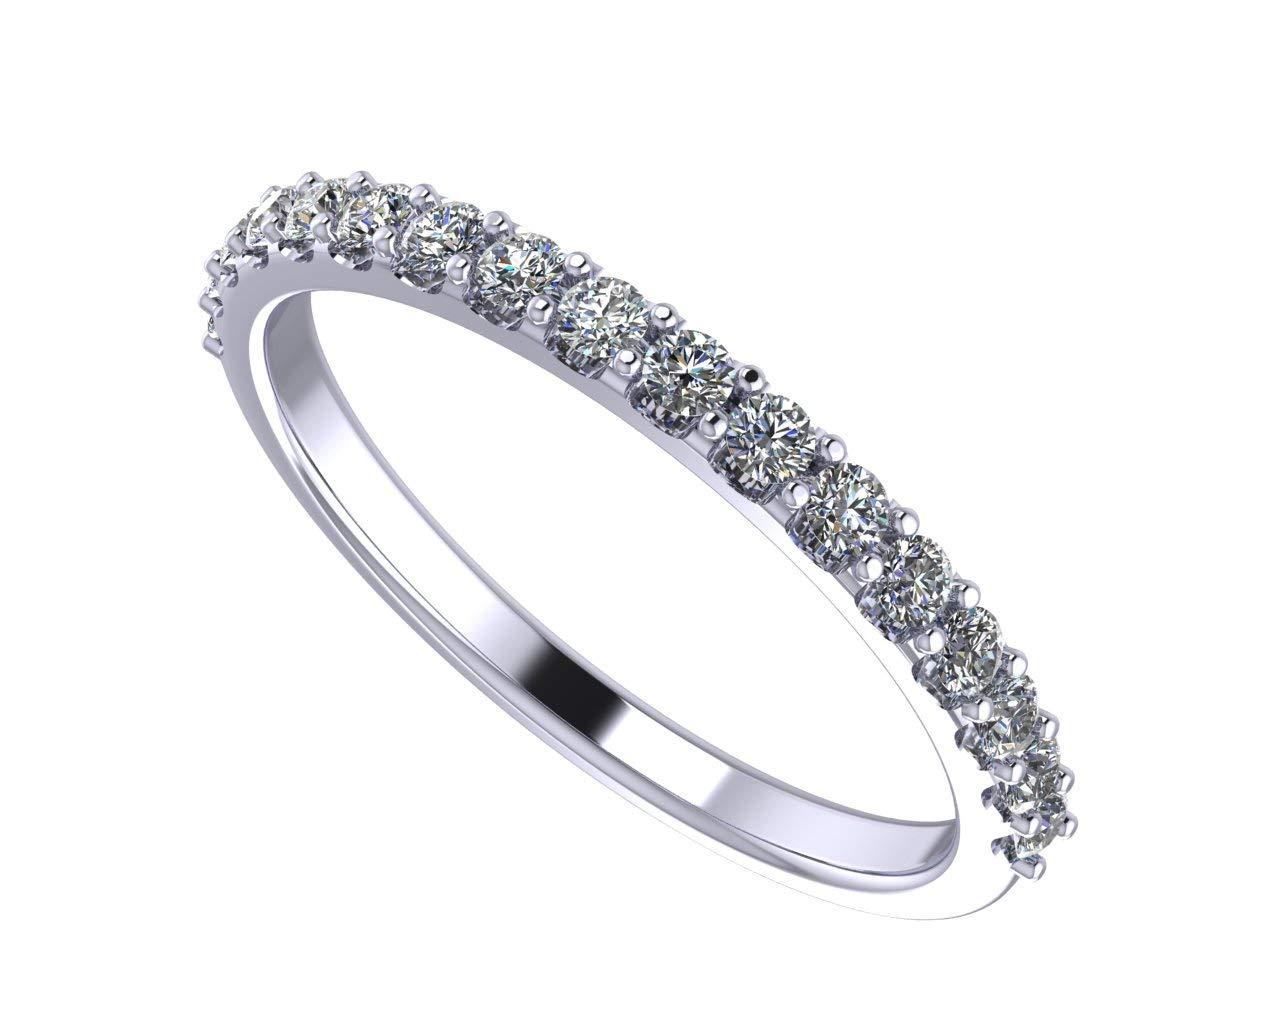 NaNa Sterling Silver & Swarovski Zirconia Wedding Band-Rhodium Plated-Size 10